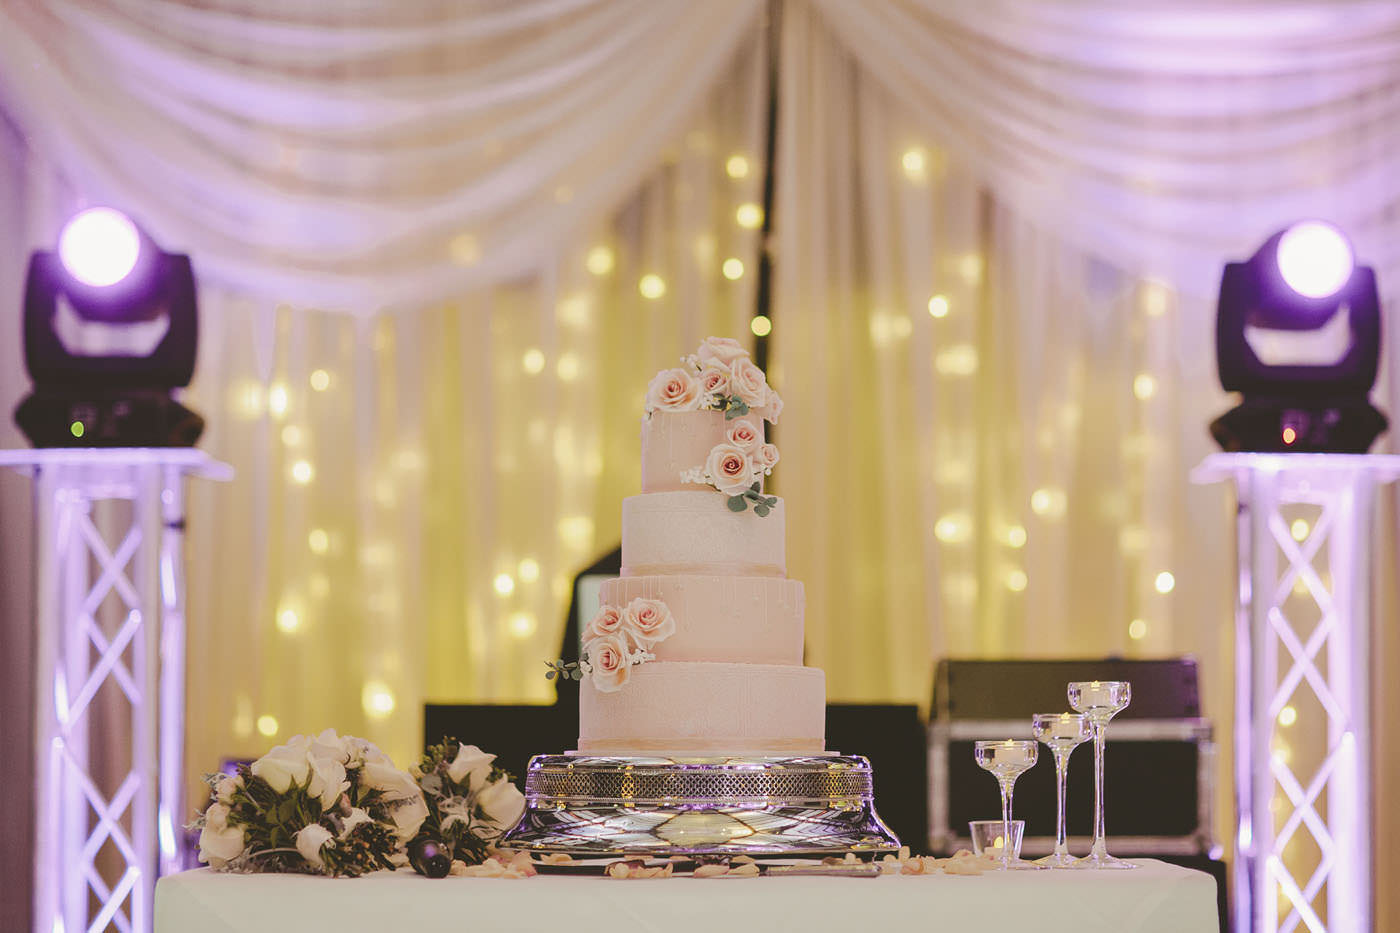 edmundjasveen burford bridge hotel wedding photographer 0106